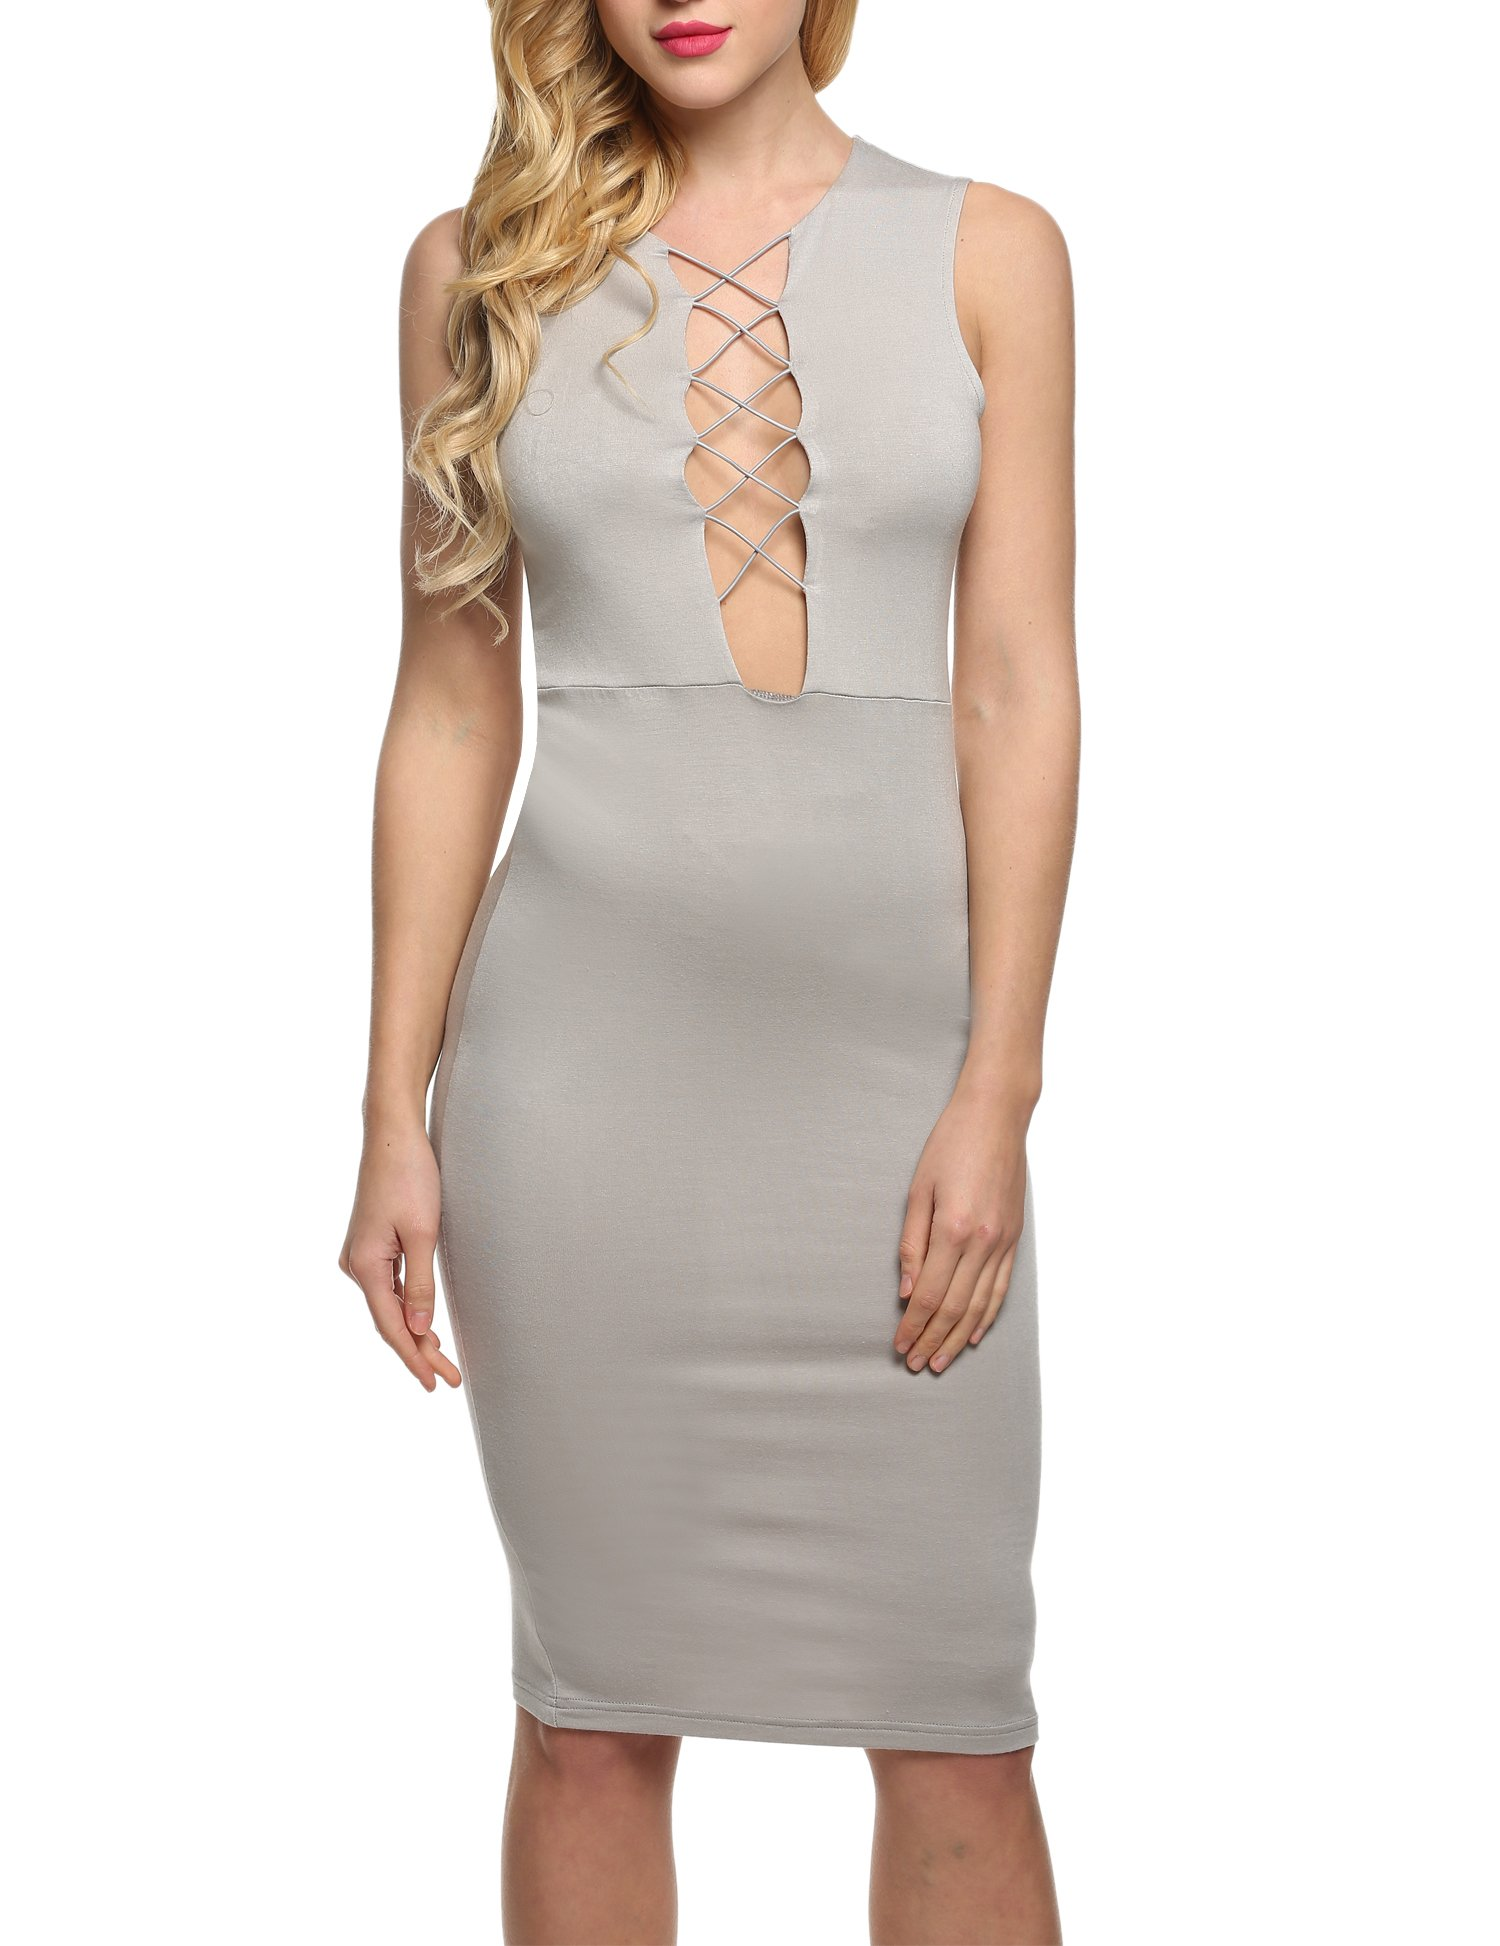 Zeagoo Women's Velvet Sexy Bodycon Backless Spaghetti Strap Bandage Slip Mini Party Dress